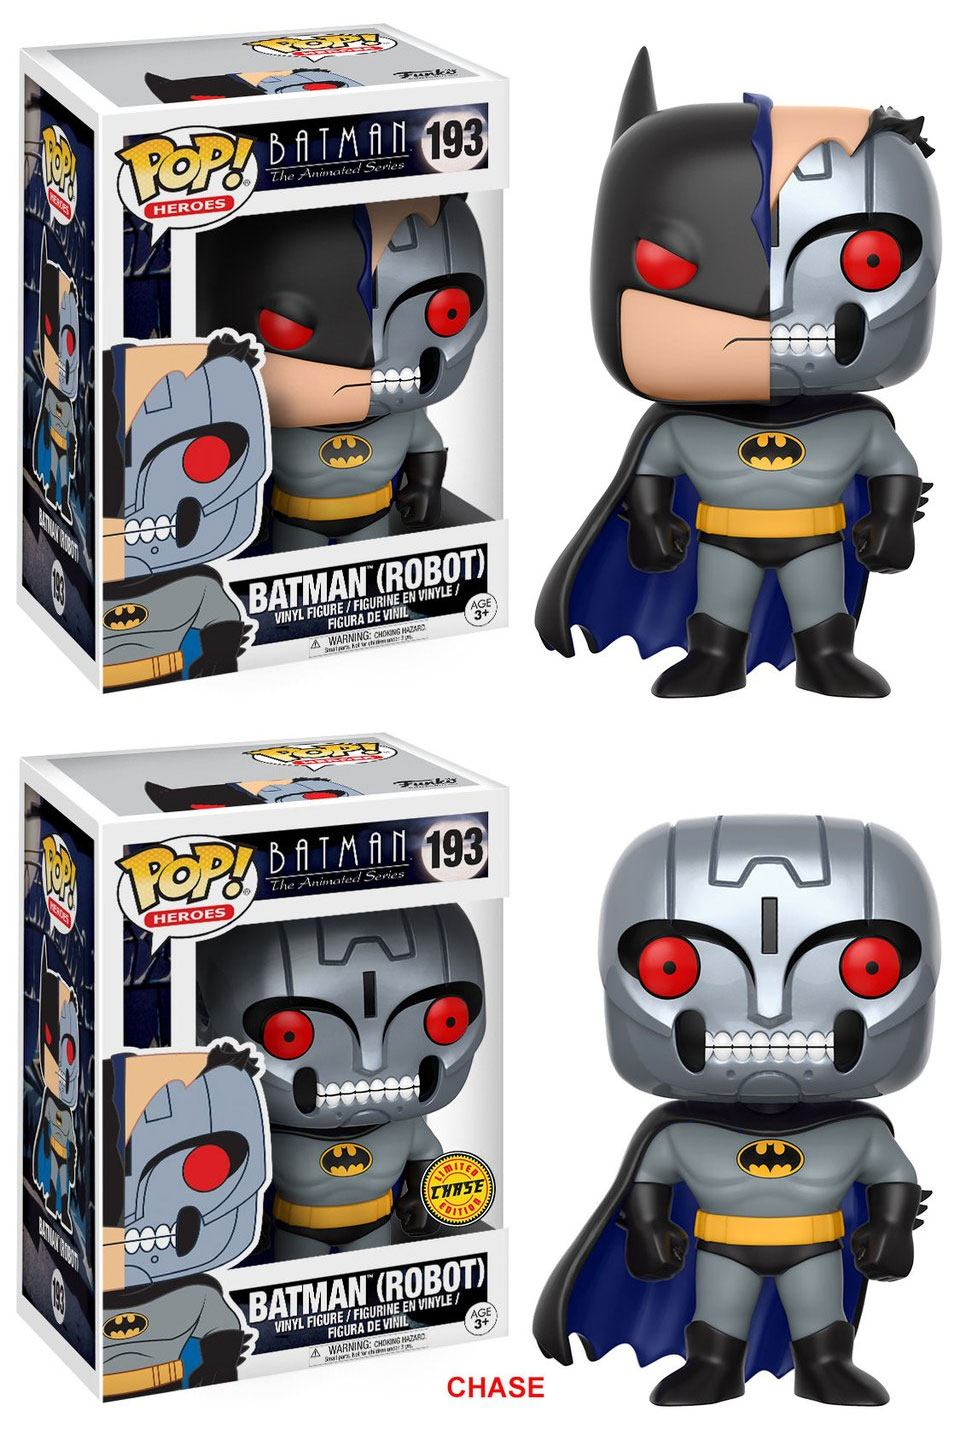 Batman The Animated Series POP! Heroes Vinyl Figures 9 cm Batman Robot Assortment (2)